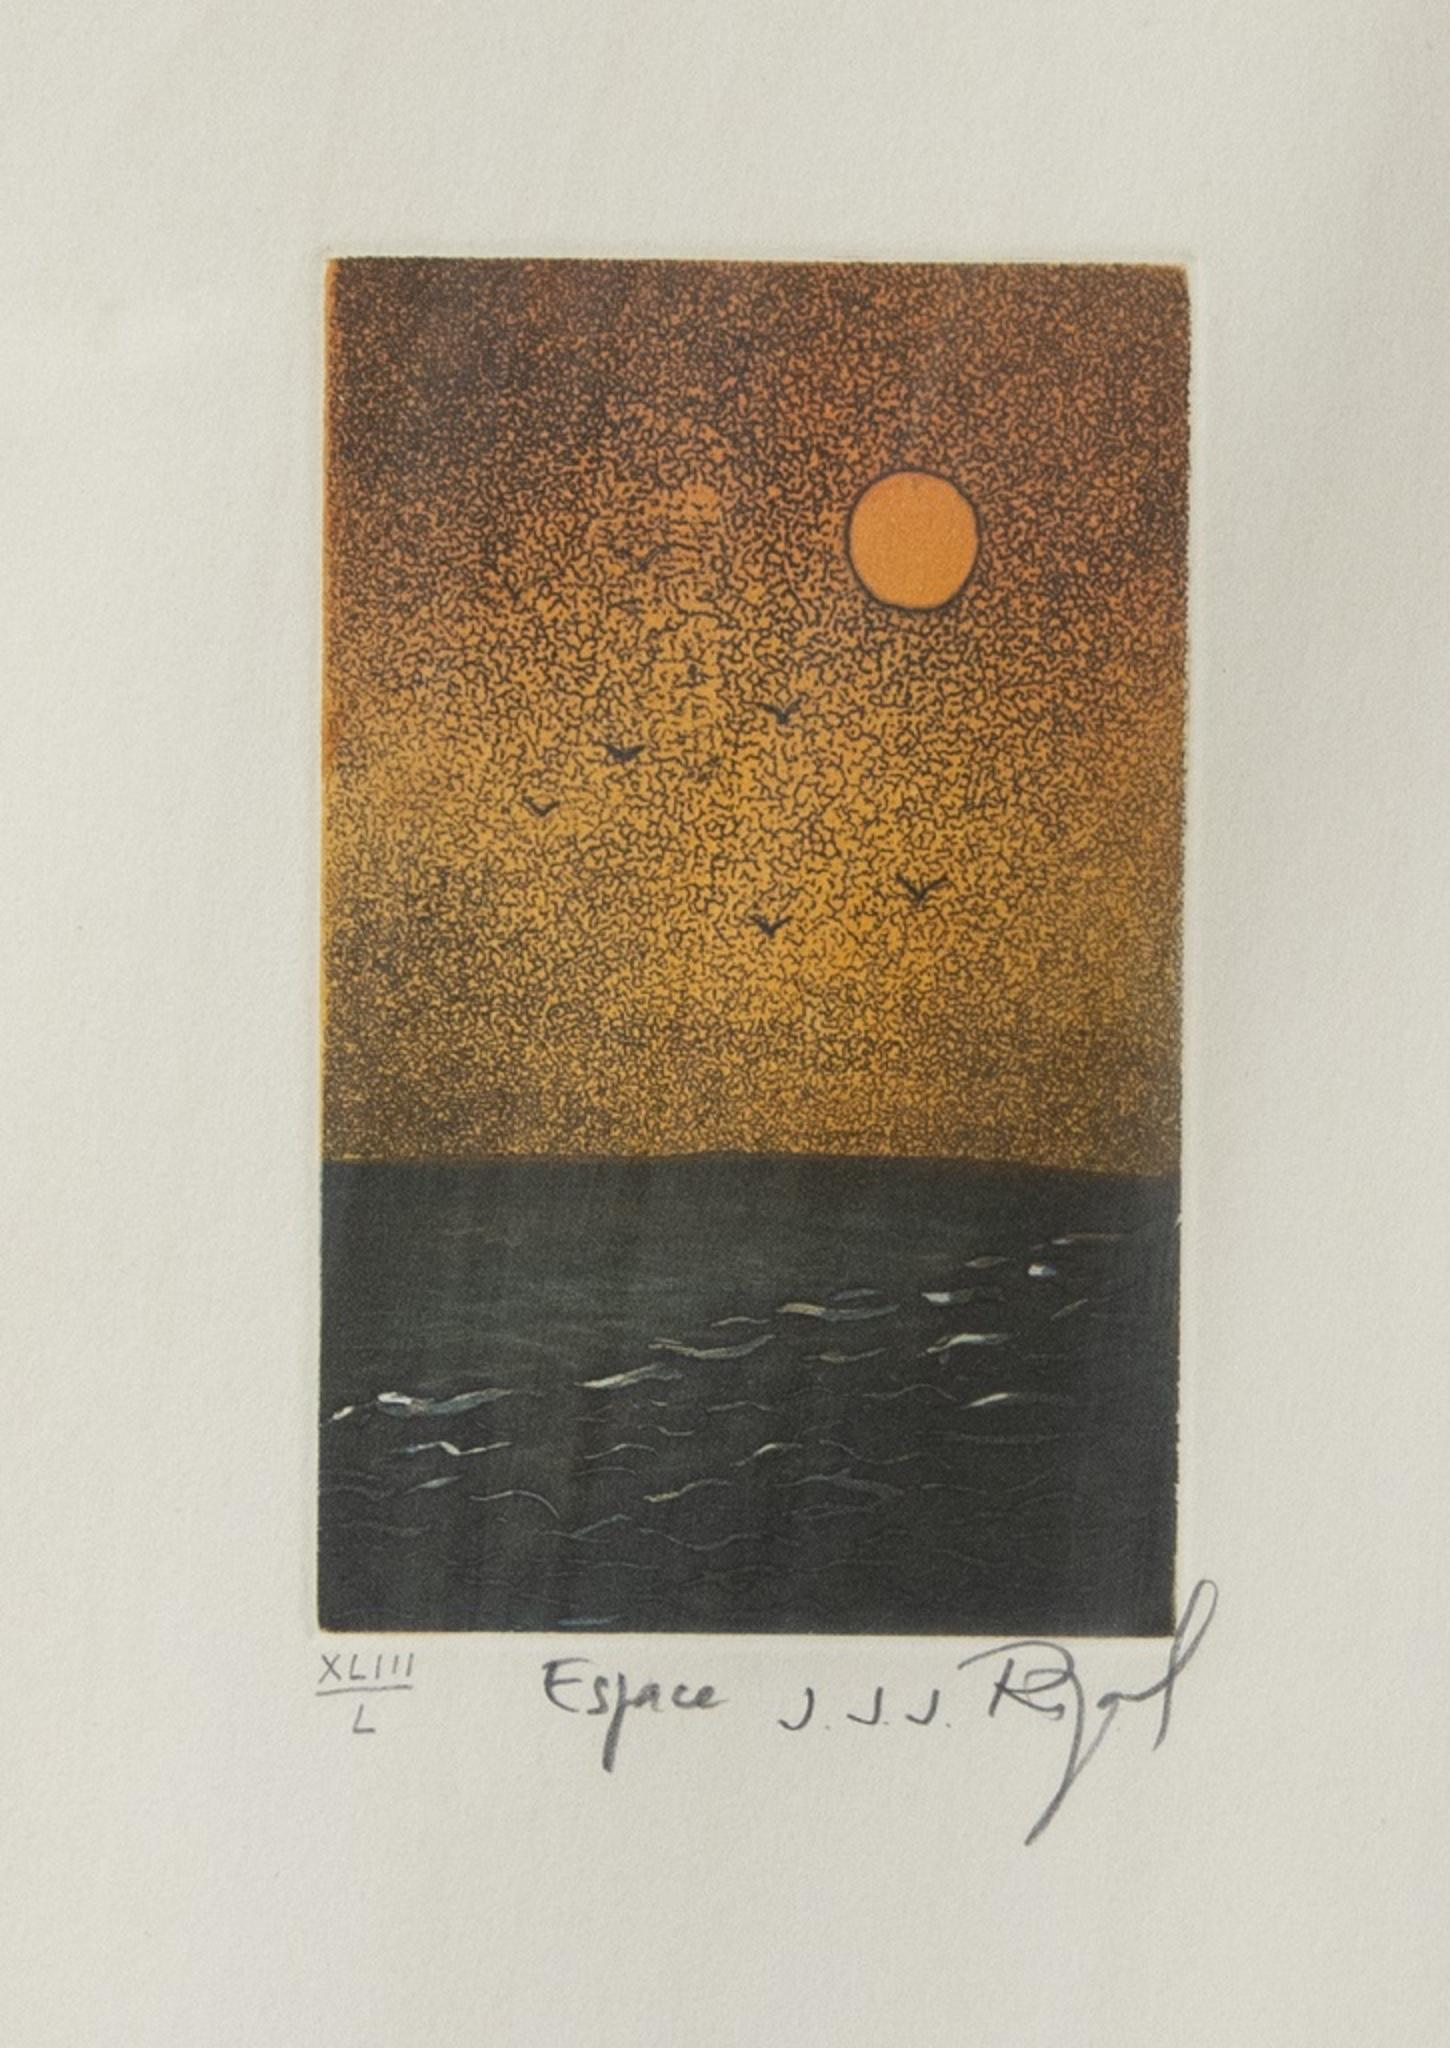 Espace  - Original Etching by Jacques Joachim Jean Rigal -  1980s